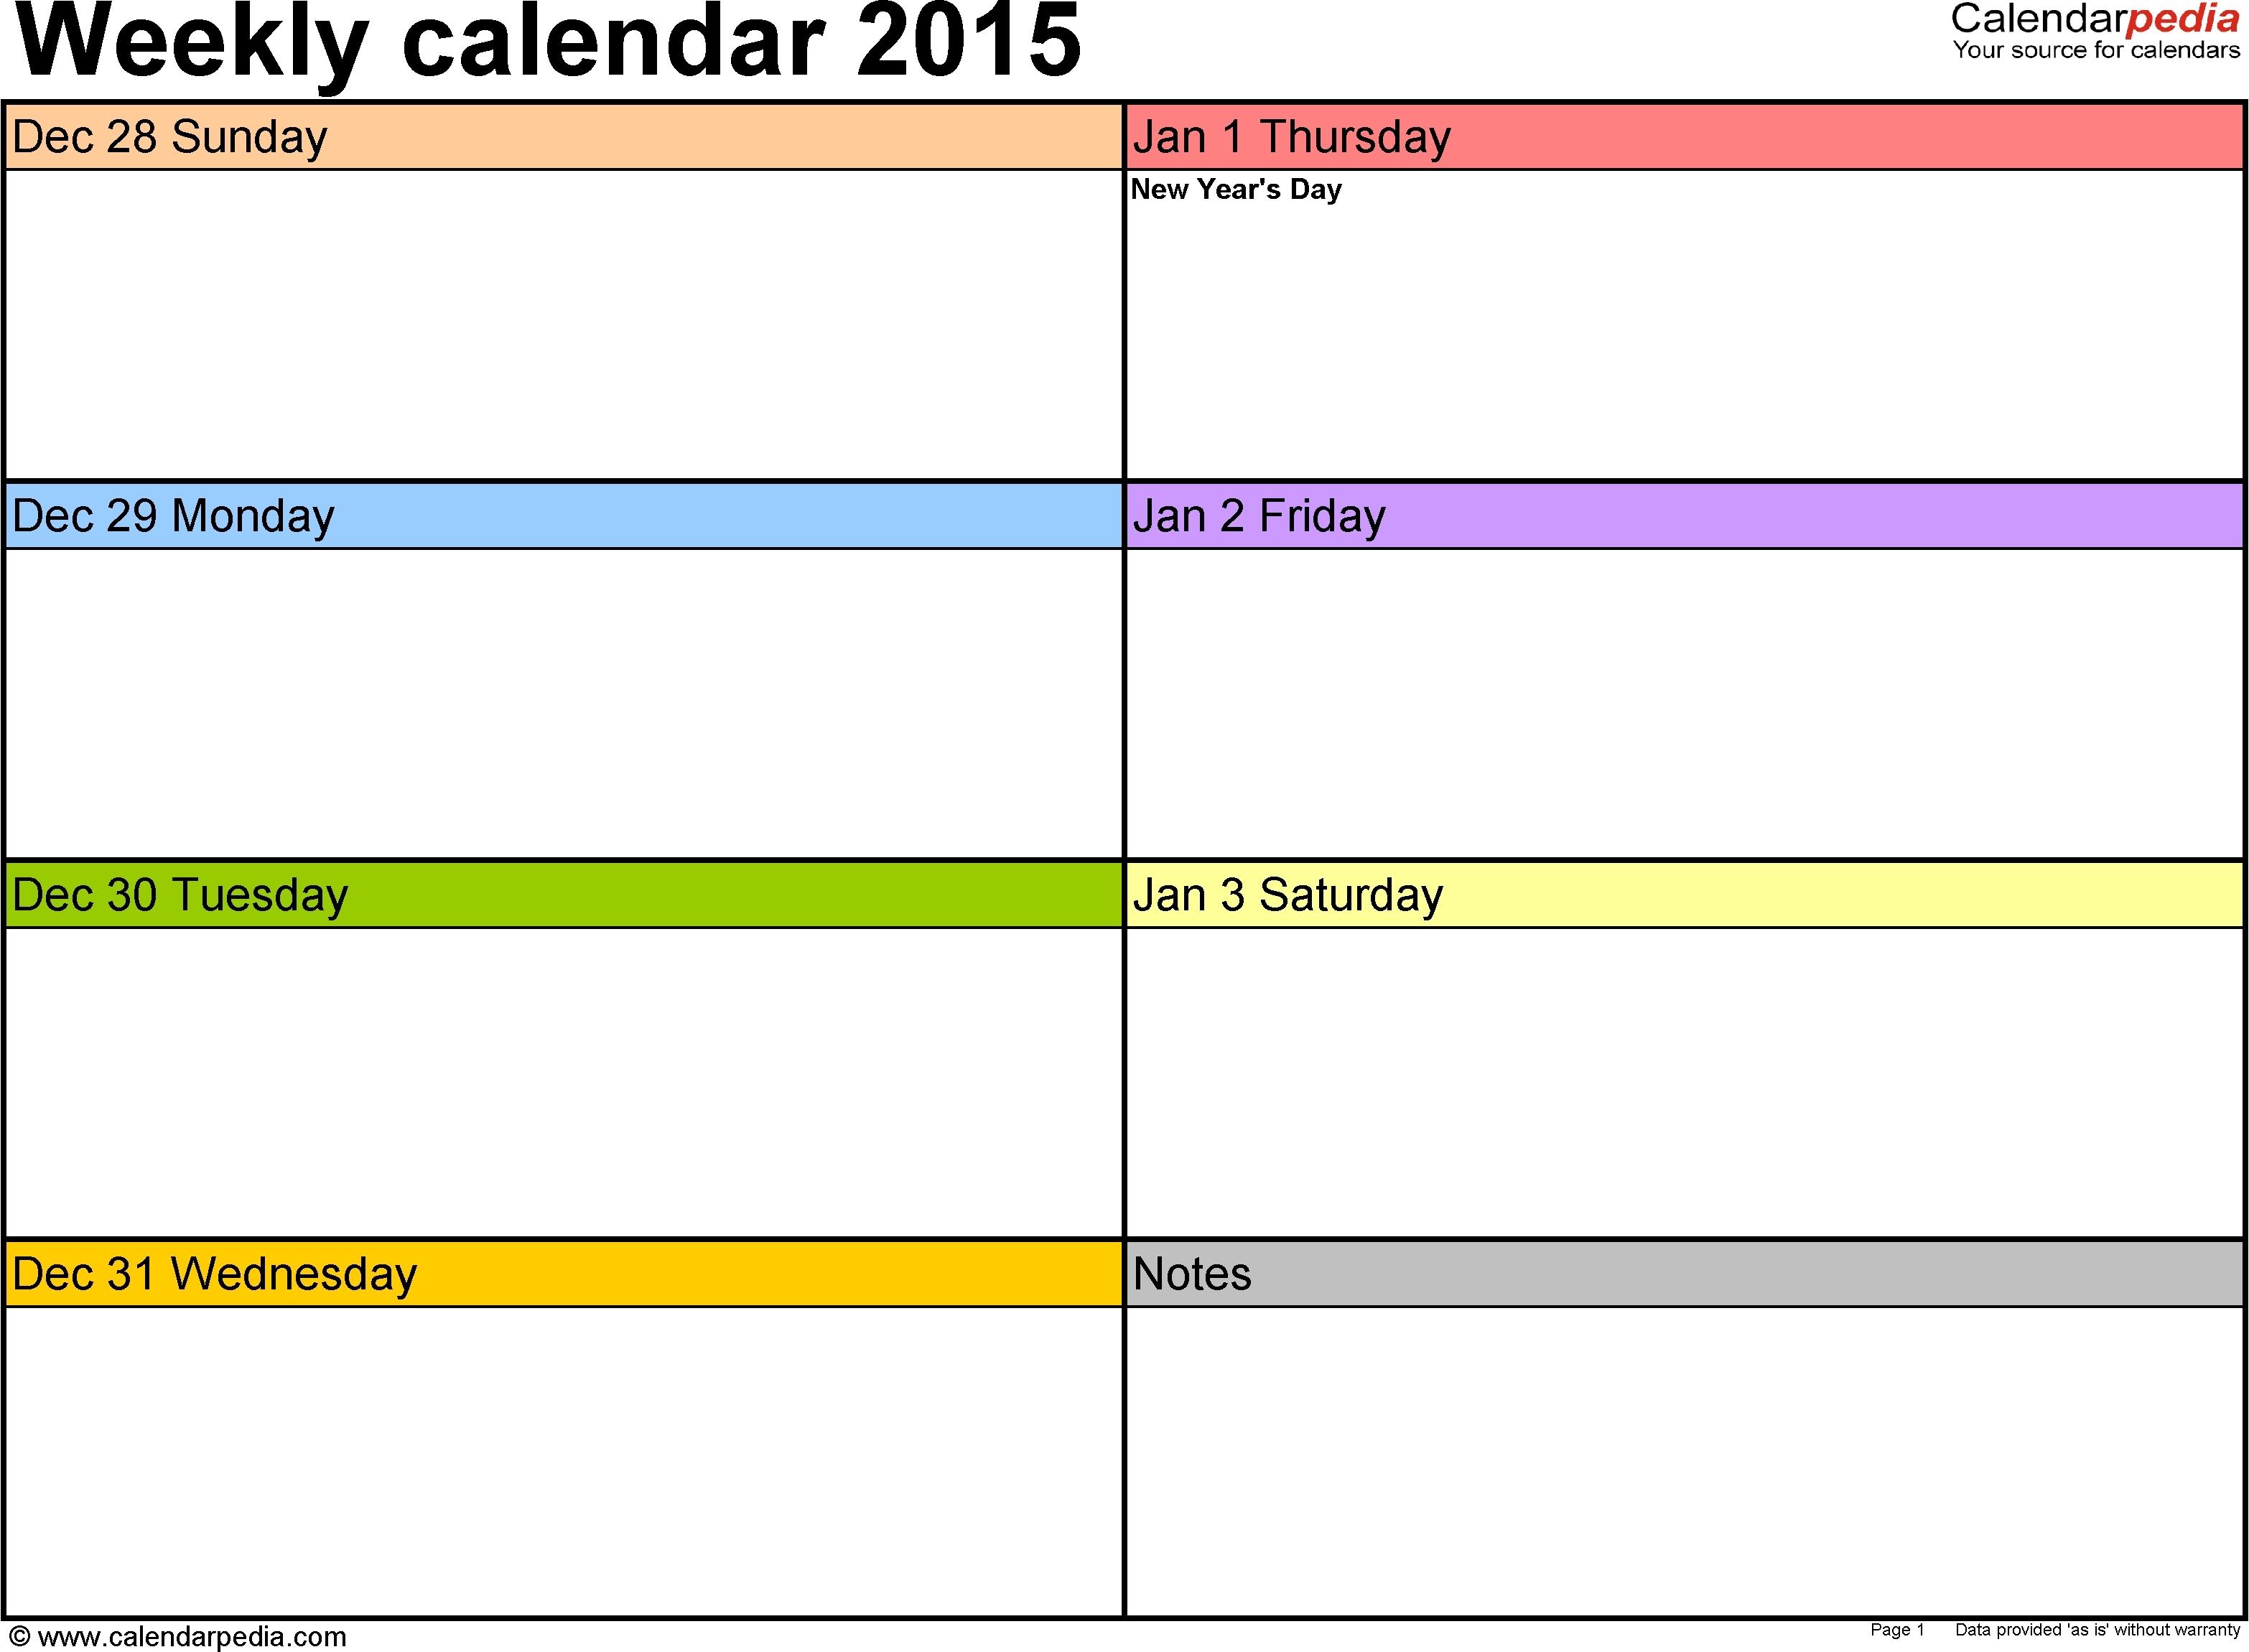 Weekly Printable Calendar 2015 | Hauck Mansion with regard to Blank Chore Calendar Printable Week Day 5